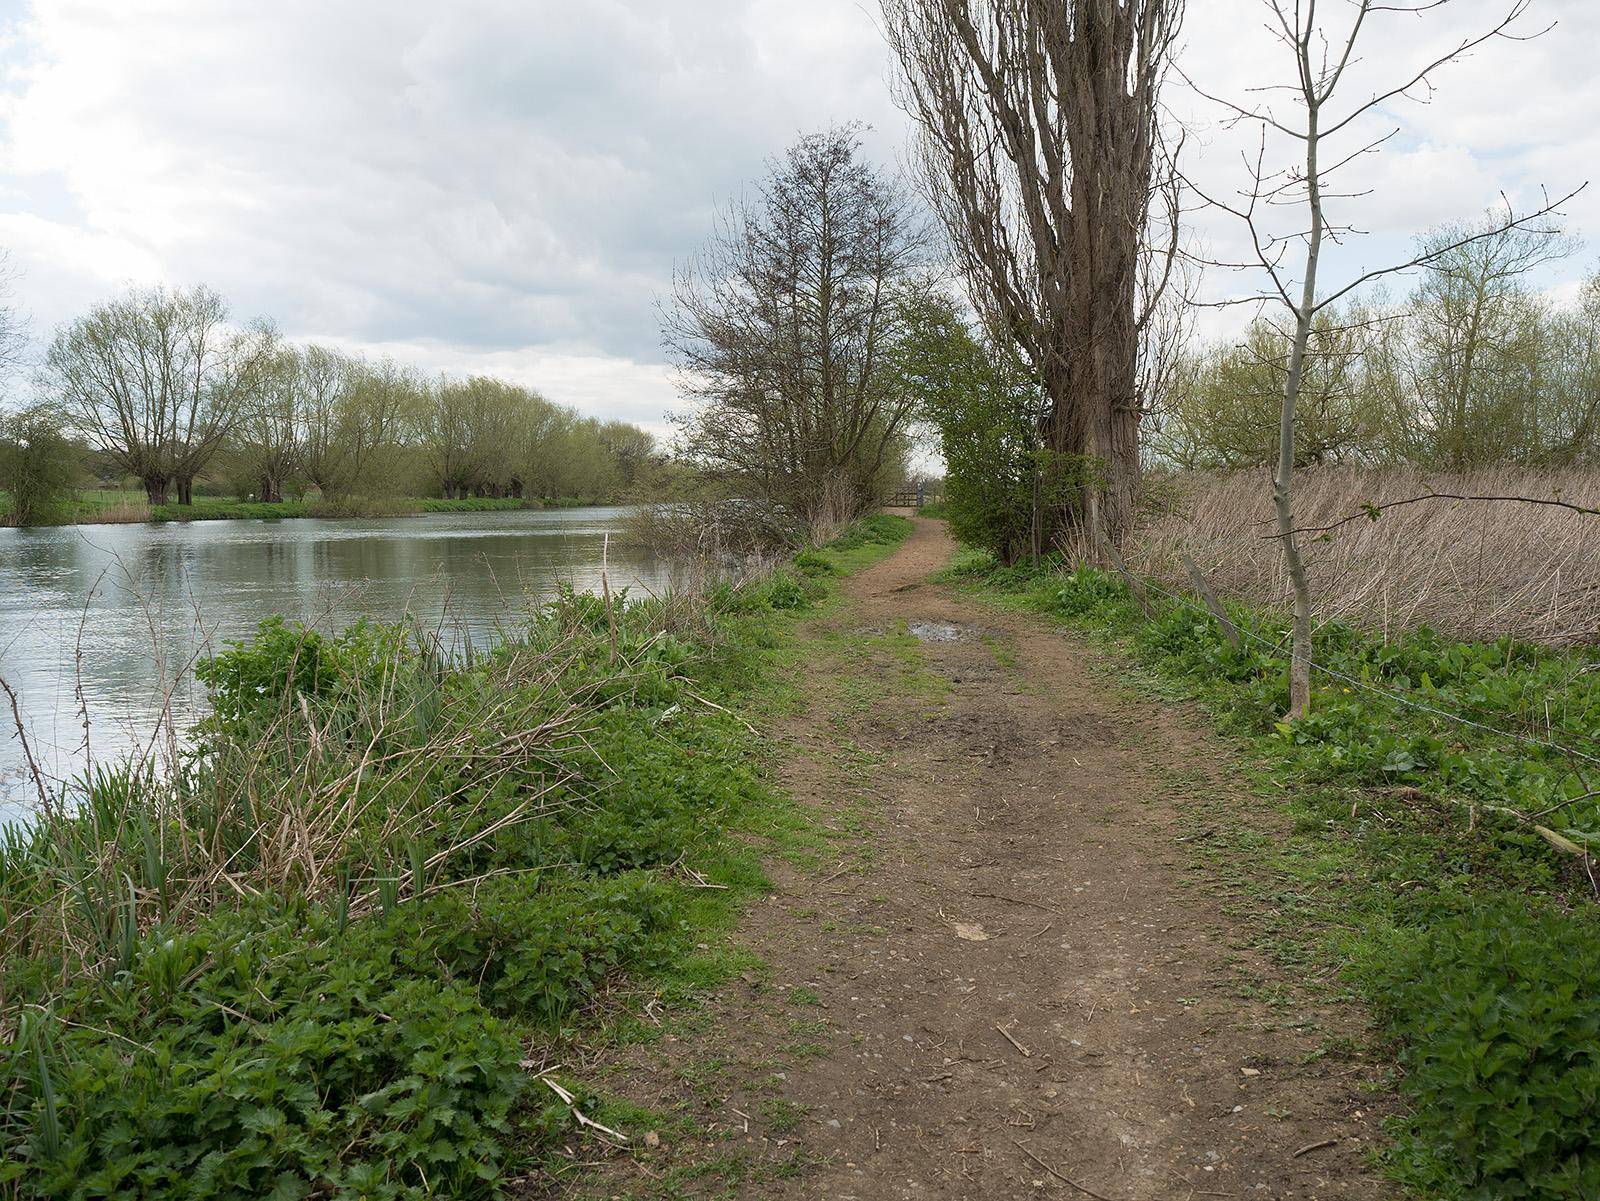 The path away from Benson Marina - a little earthen again.